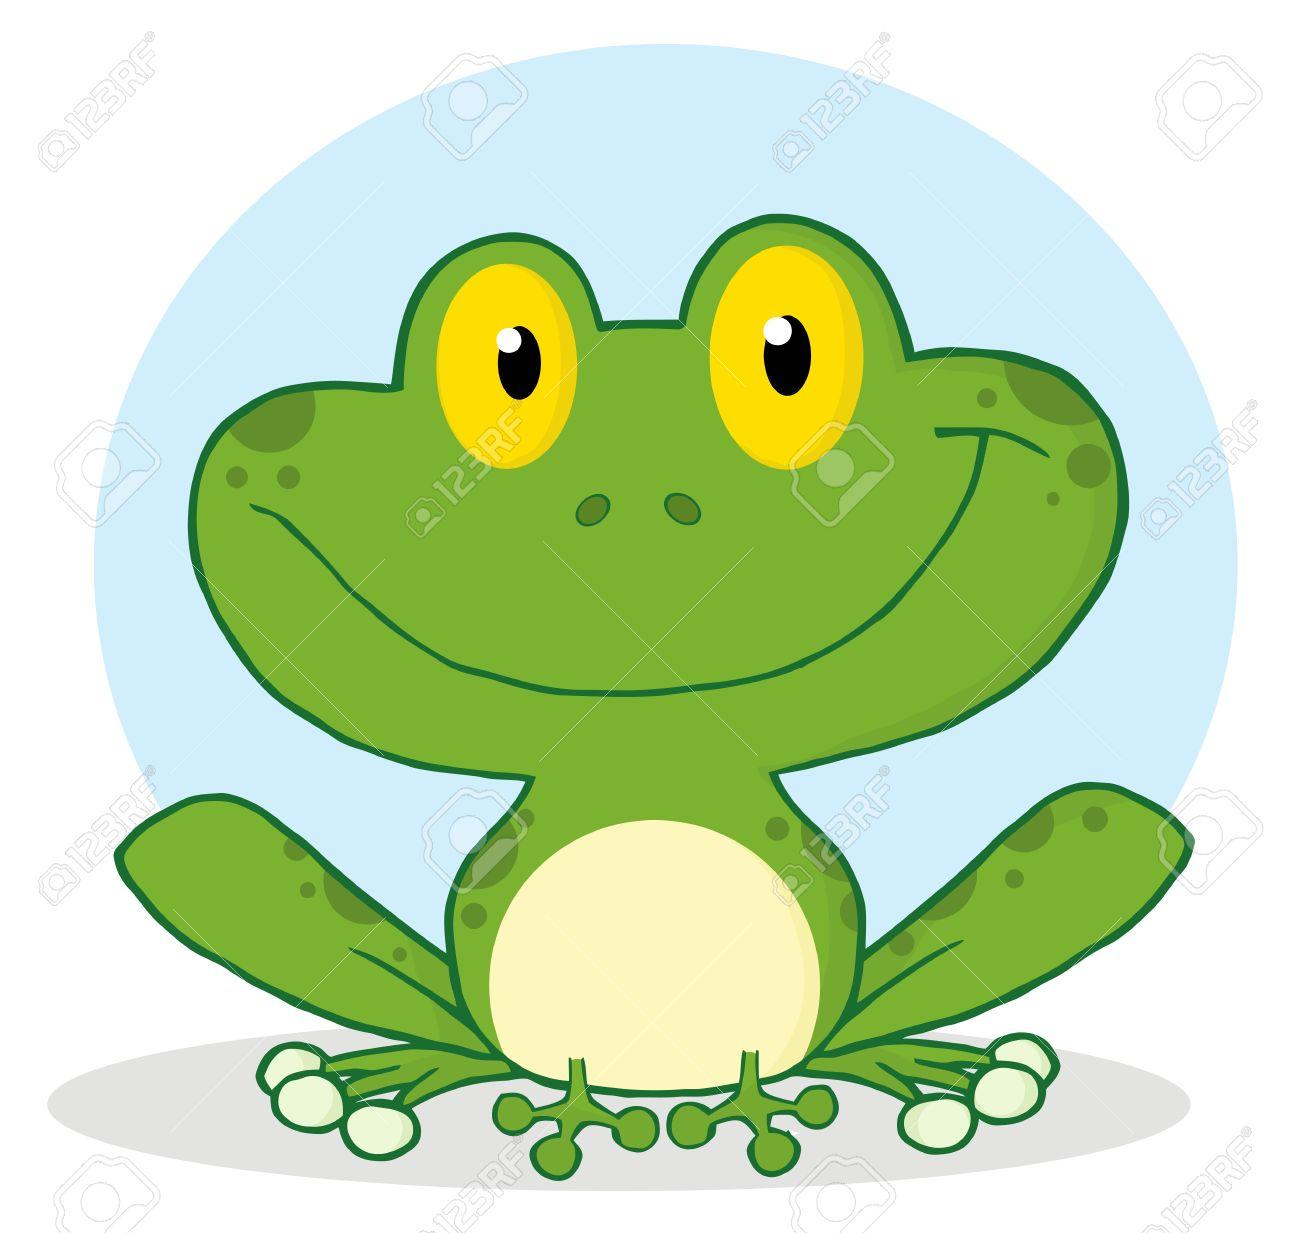 Smile Frog Cartoon Character - 8930304